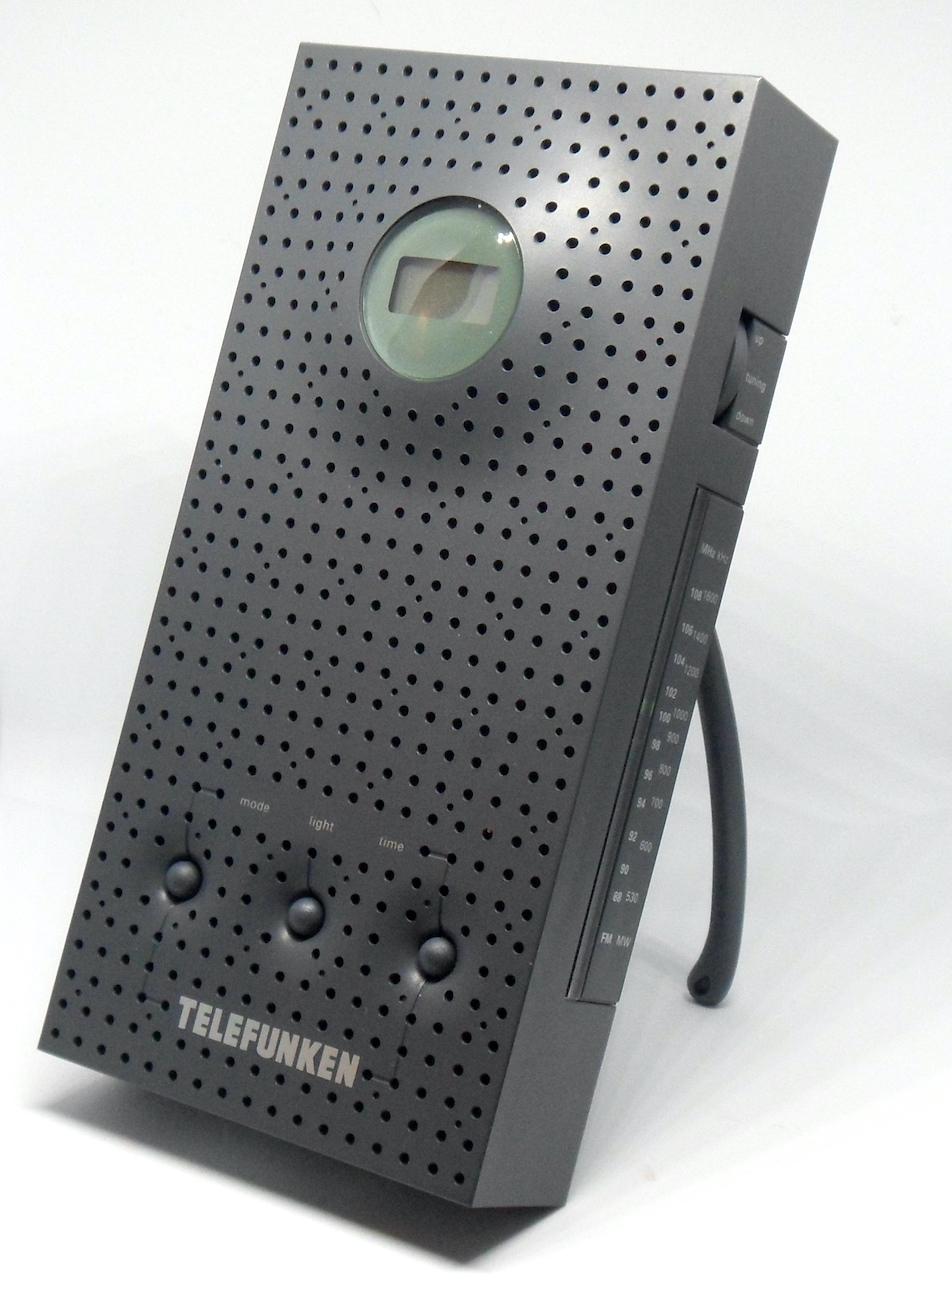 Radio R15 (Thomson) & RT201 (Telefunken) - by Philippe Starck